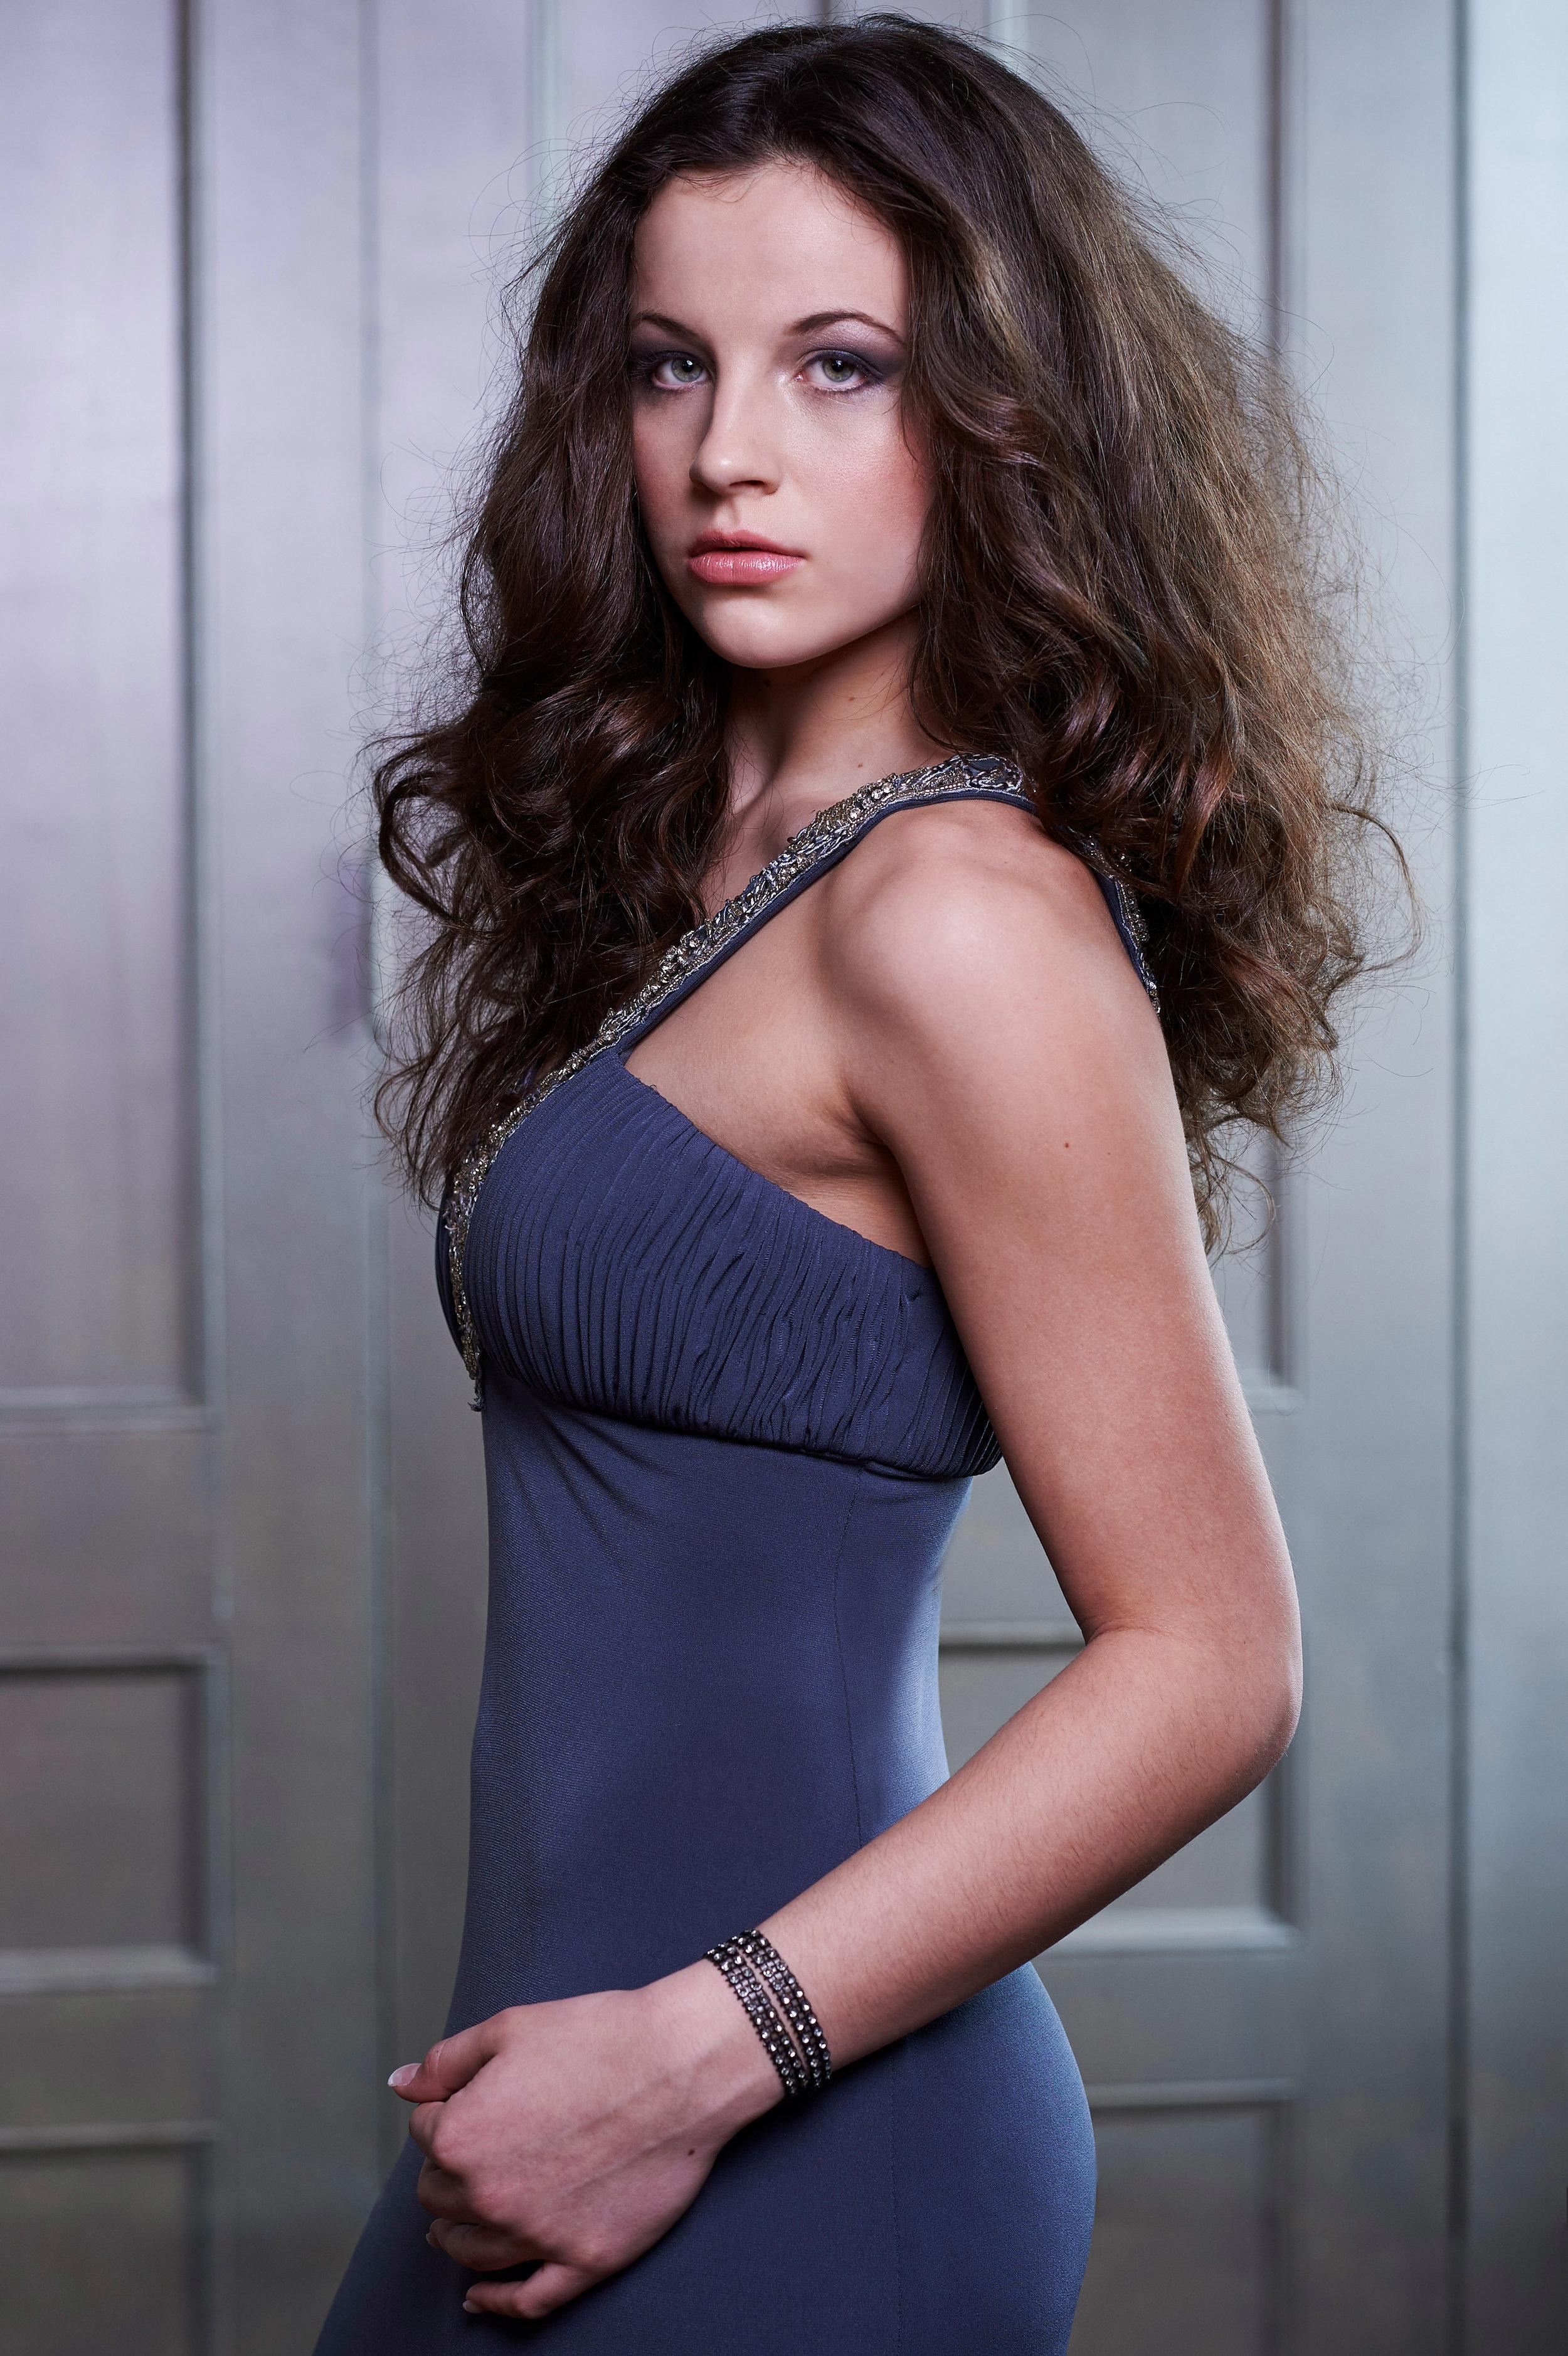 Marta-Hewson-Jaclyn-Baker-Model-Portfolio-3503.jpg